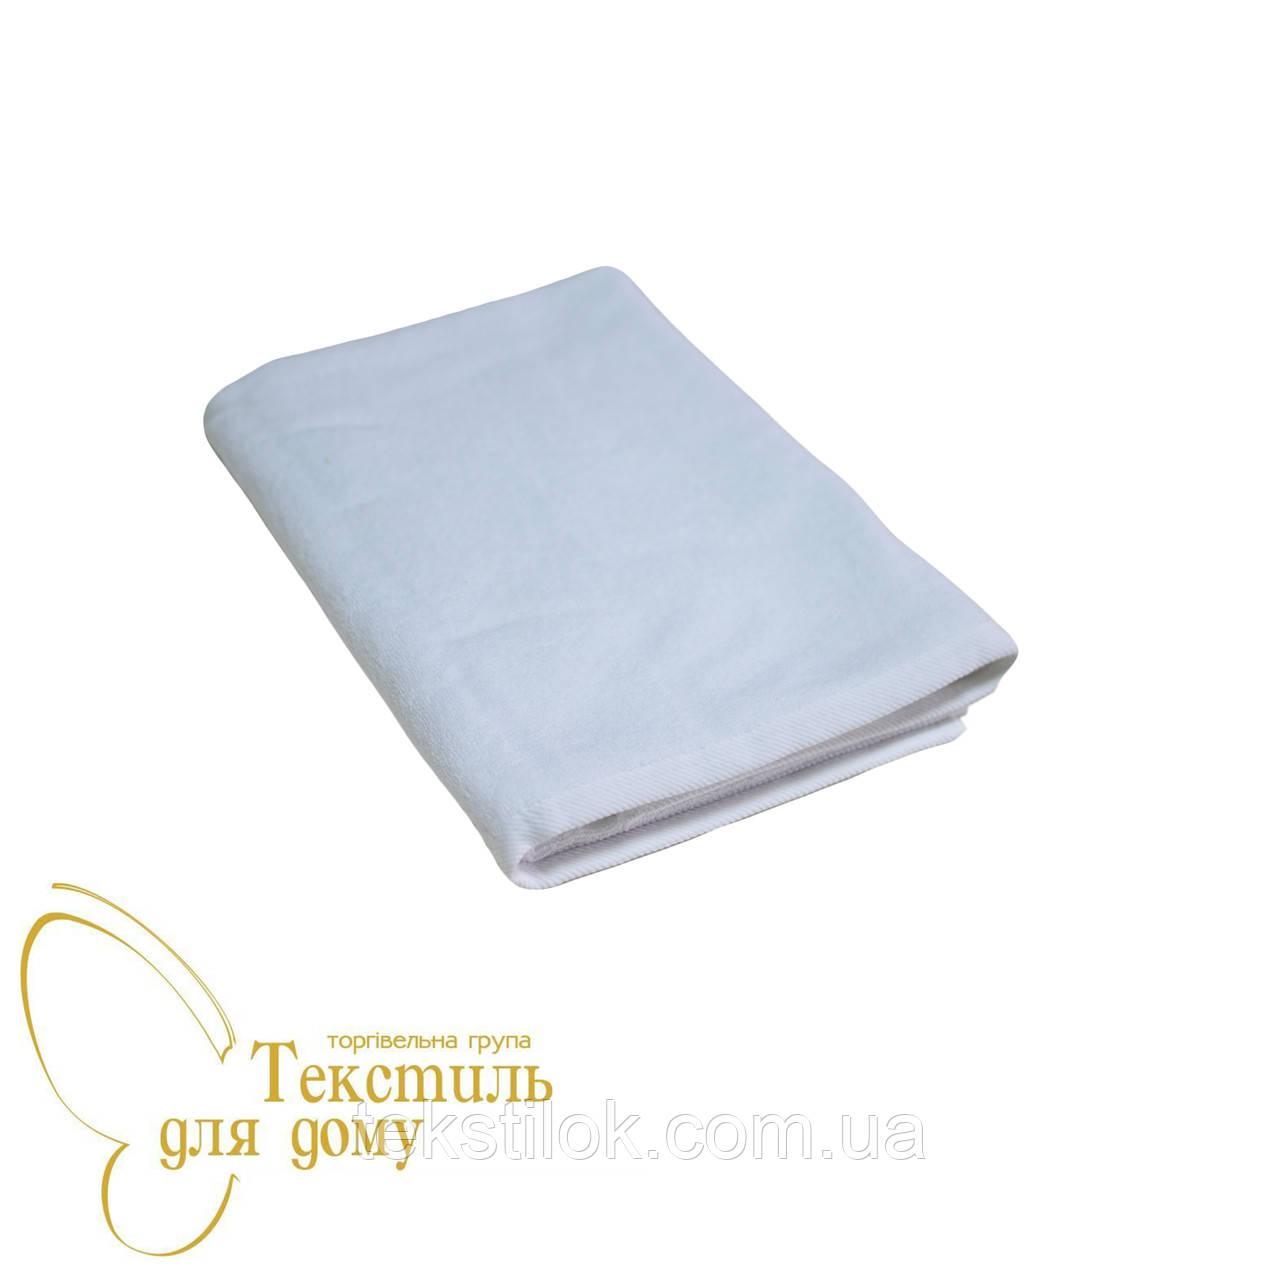 Полотенце банное 70*140, плотность 500 гр/м2